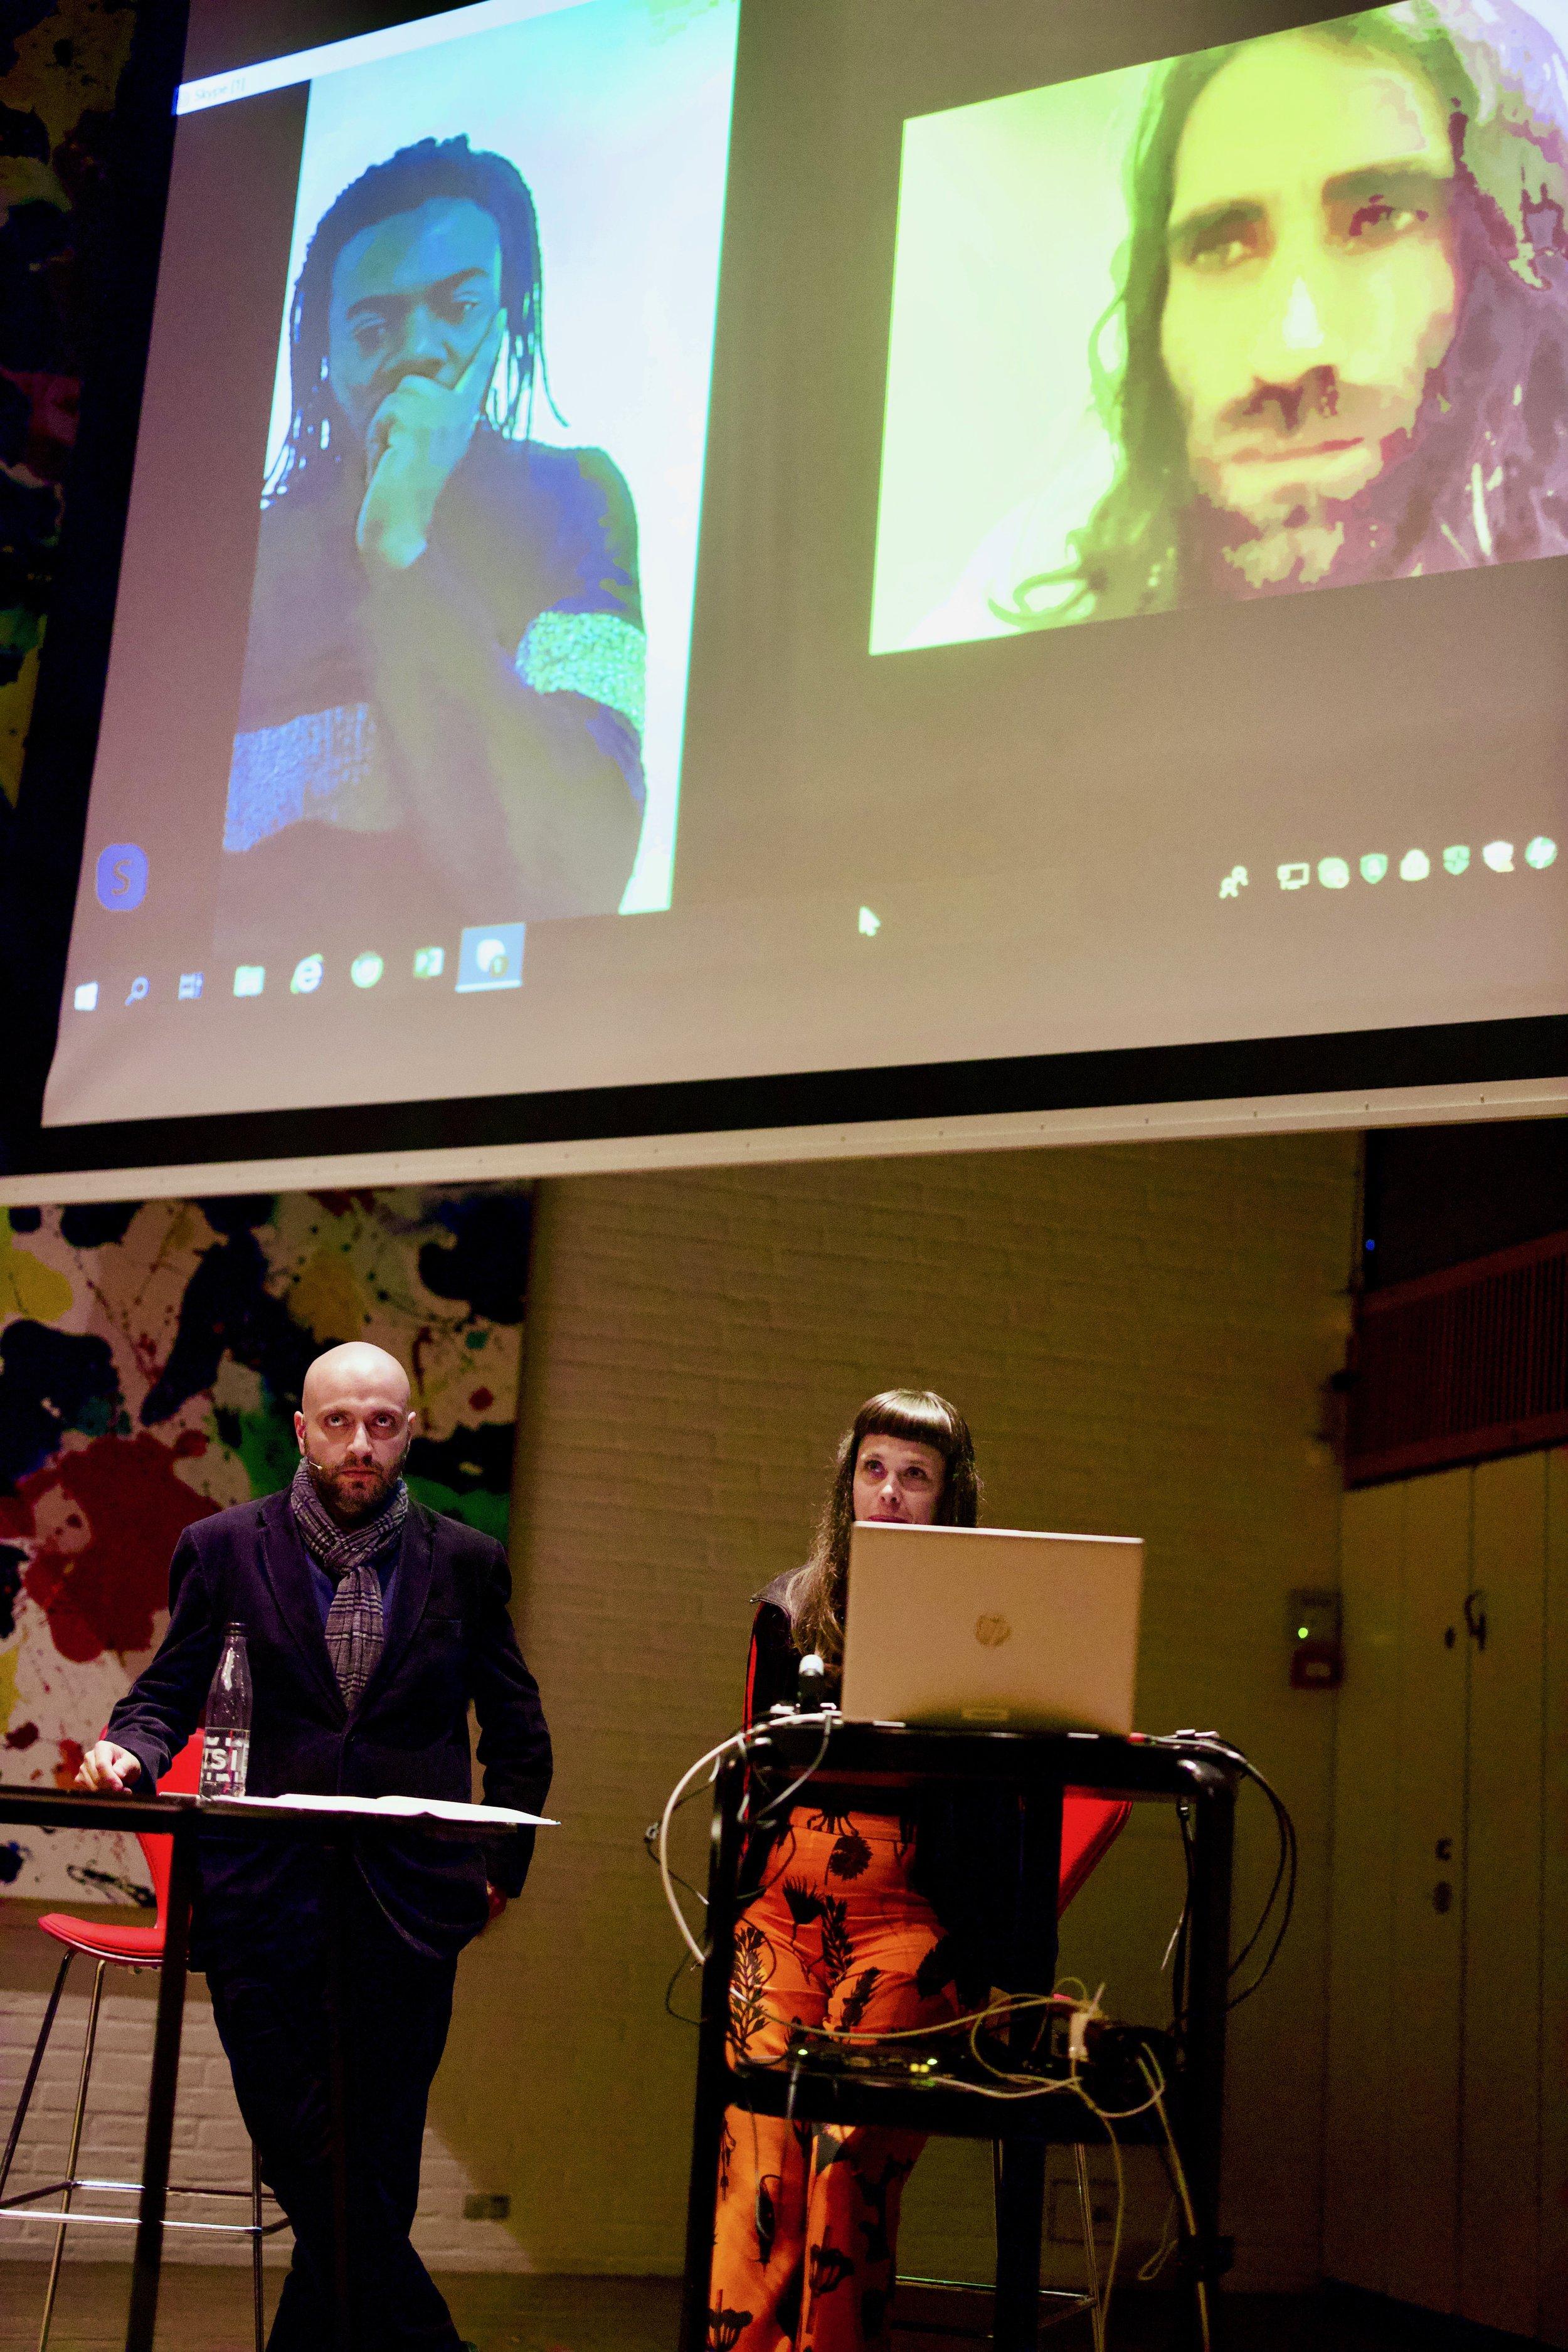 Screen - left: Stanley Edward, right: Behrouz Boochani. Floor - left: Arash Kamali Sarvestani, right: Liv Nimand Duvå